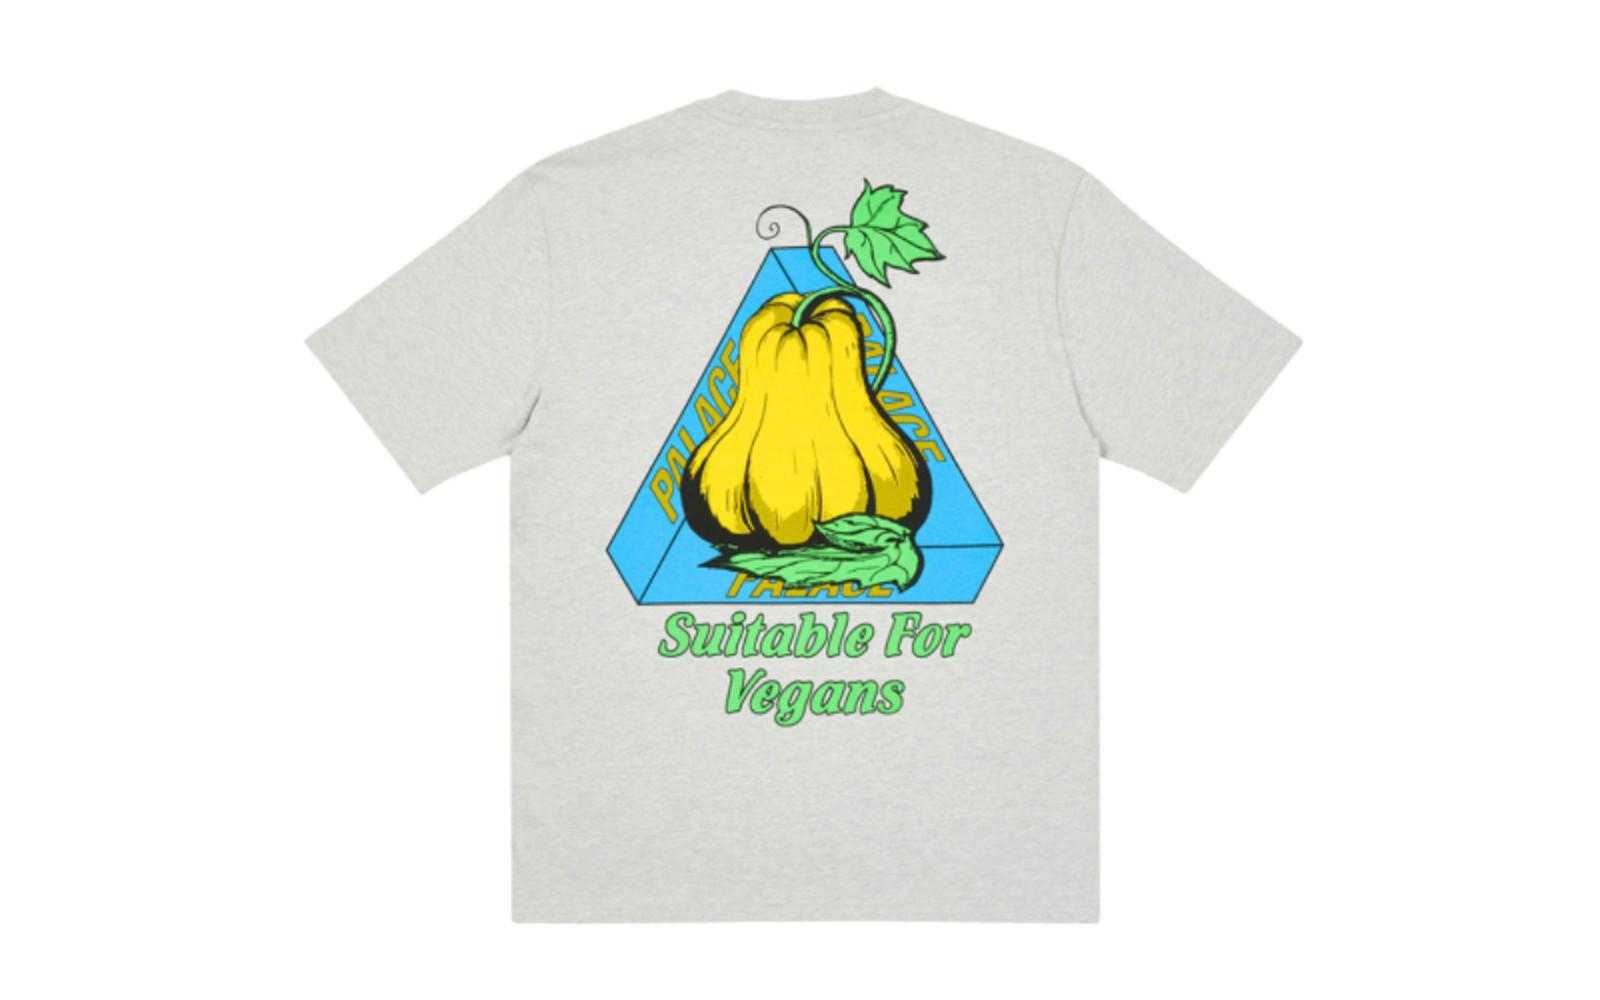 Palace Nein Cheese Egg T-shirt